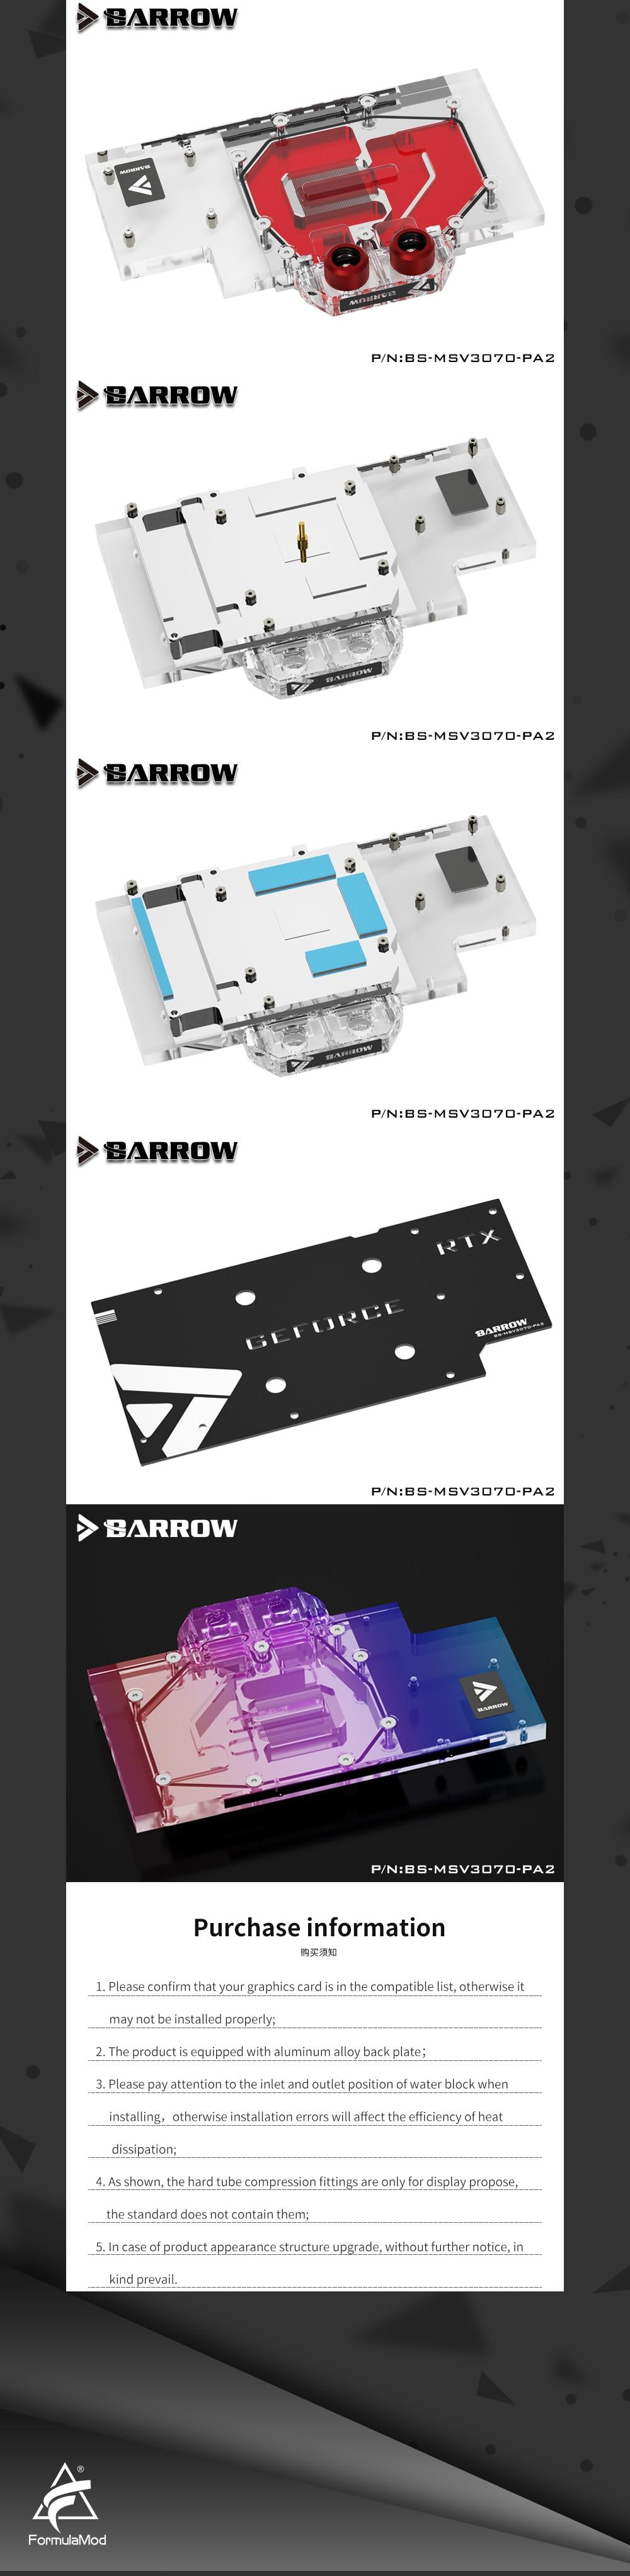 Barrow 3070 GPU Water Block for MSI RTX3070 VENTUS, Full Cover ARGB GPU Cooler, BS-MSV3070-PA2